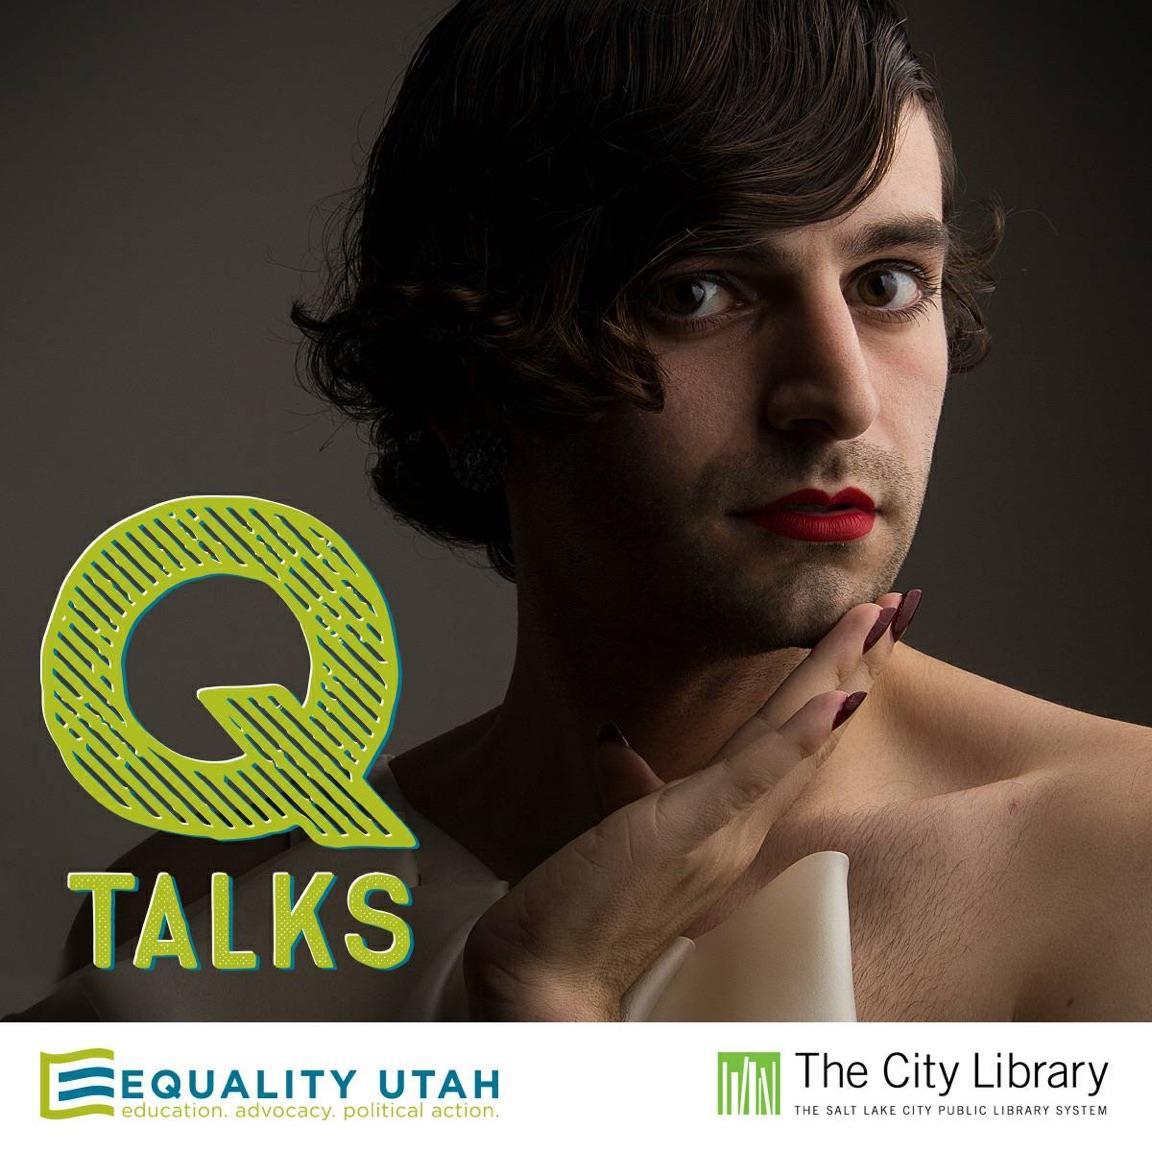 QTalks graphic featuring Jacob Tobia